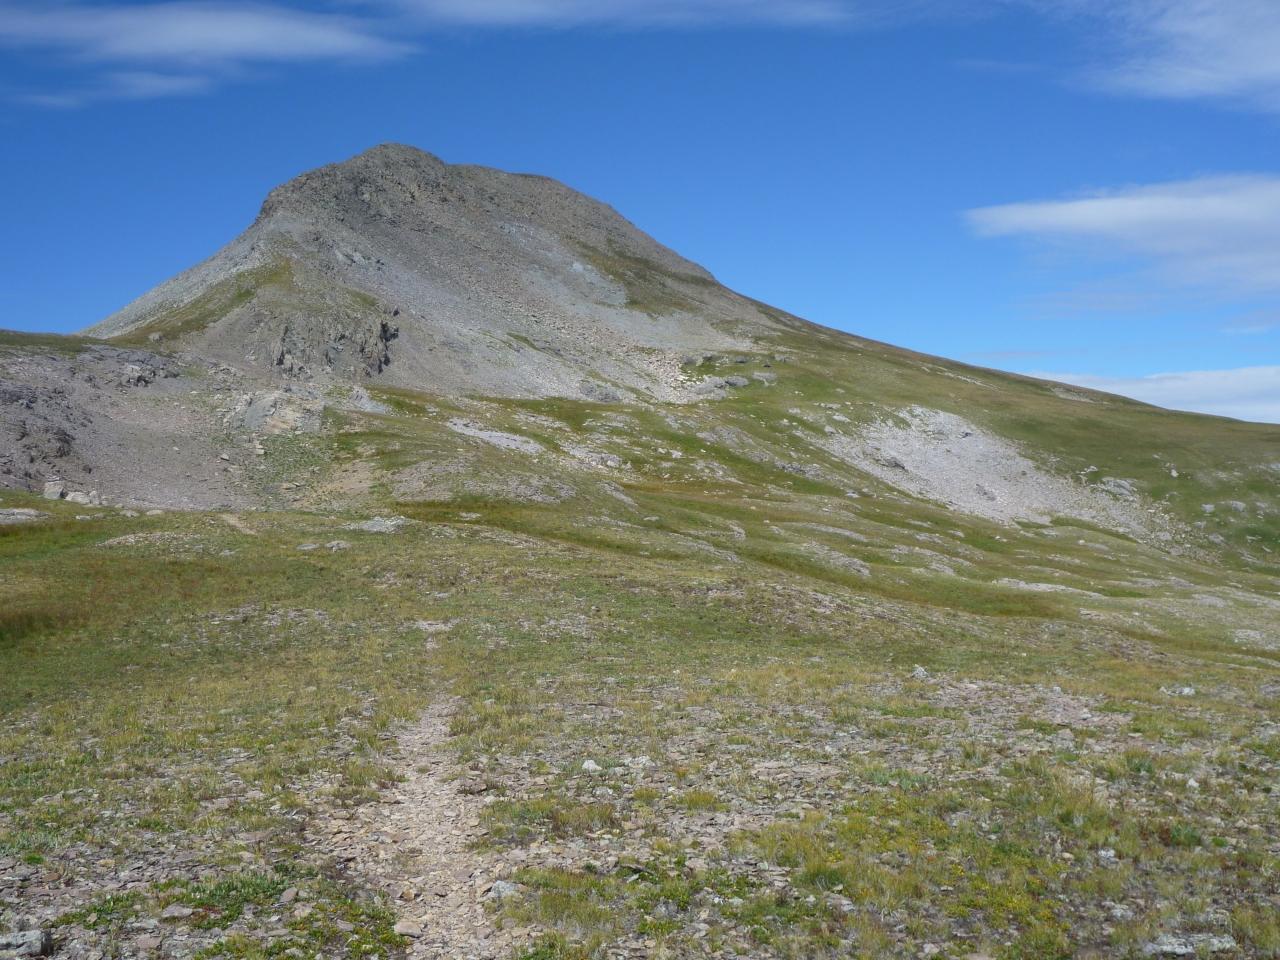 South San Juan Wilderness, 8-22 To 8-26 2010